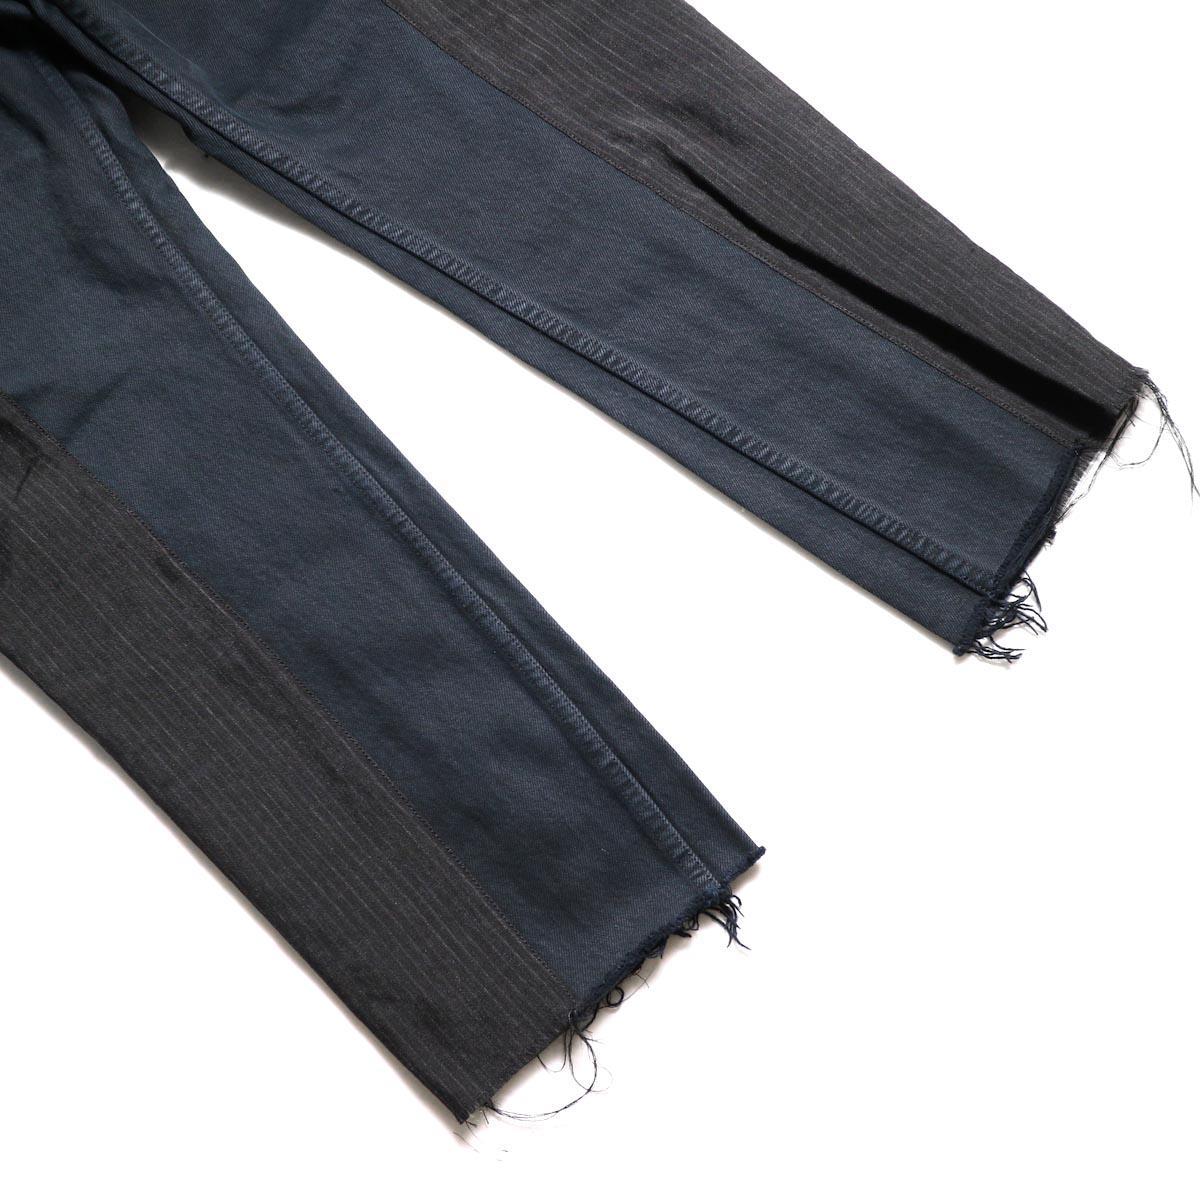 OLD PARK / Docking Jeans Black (Ssize-B)裾